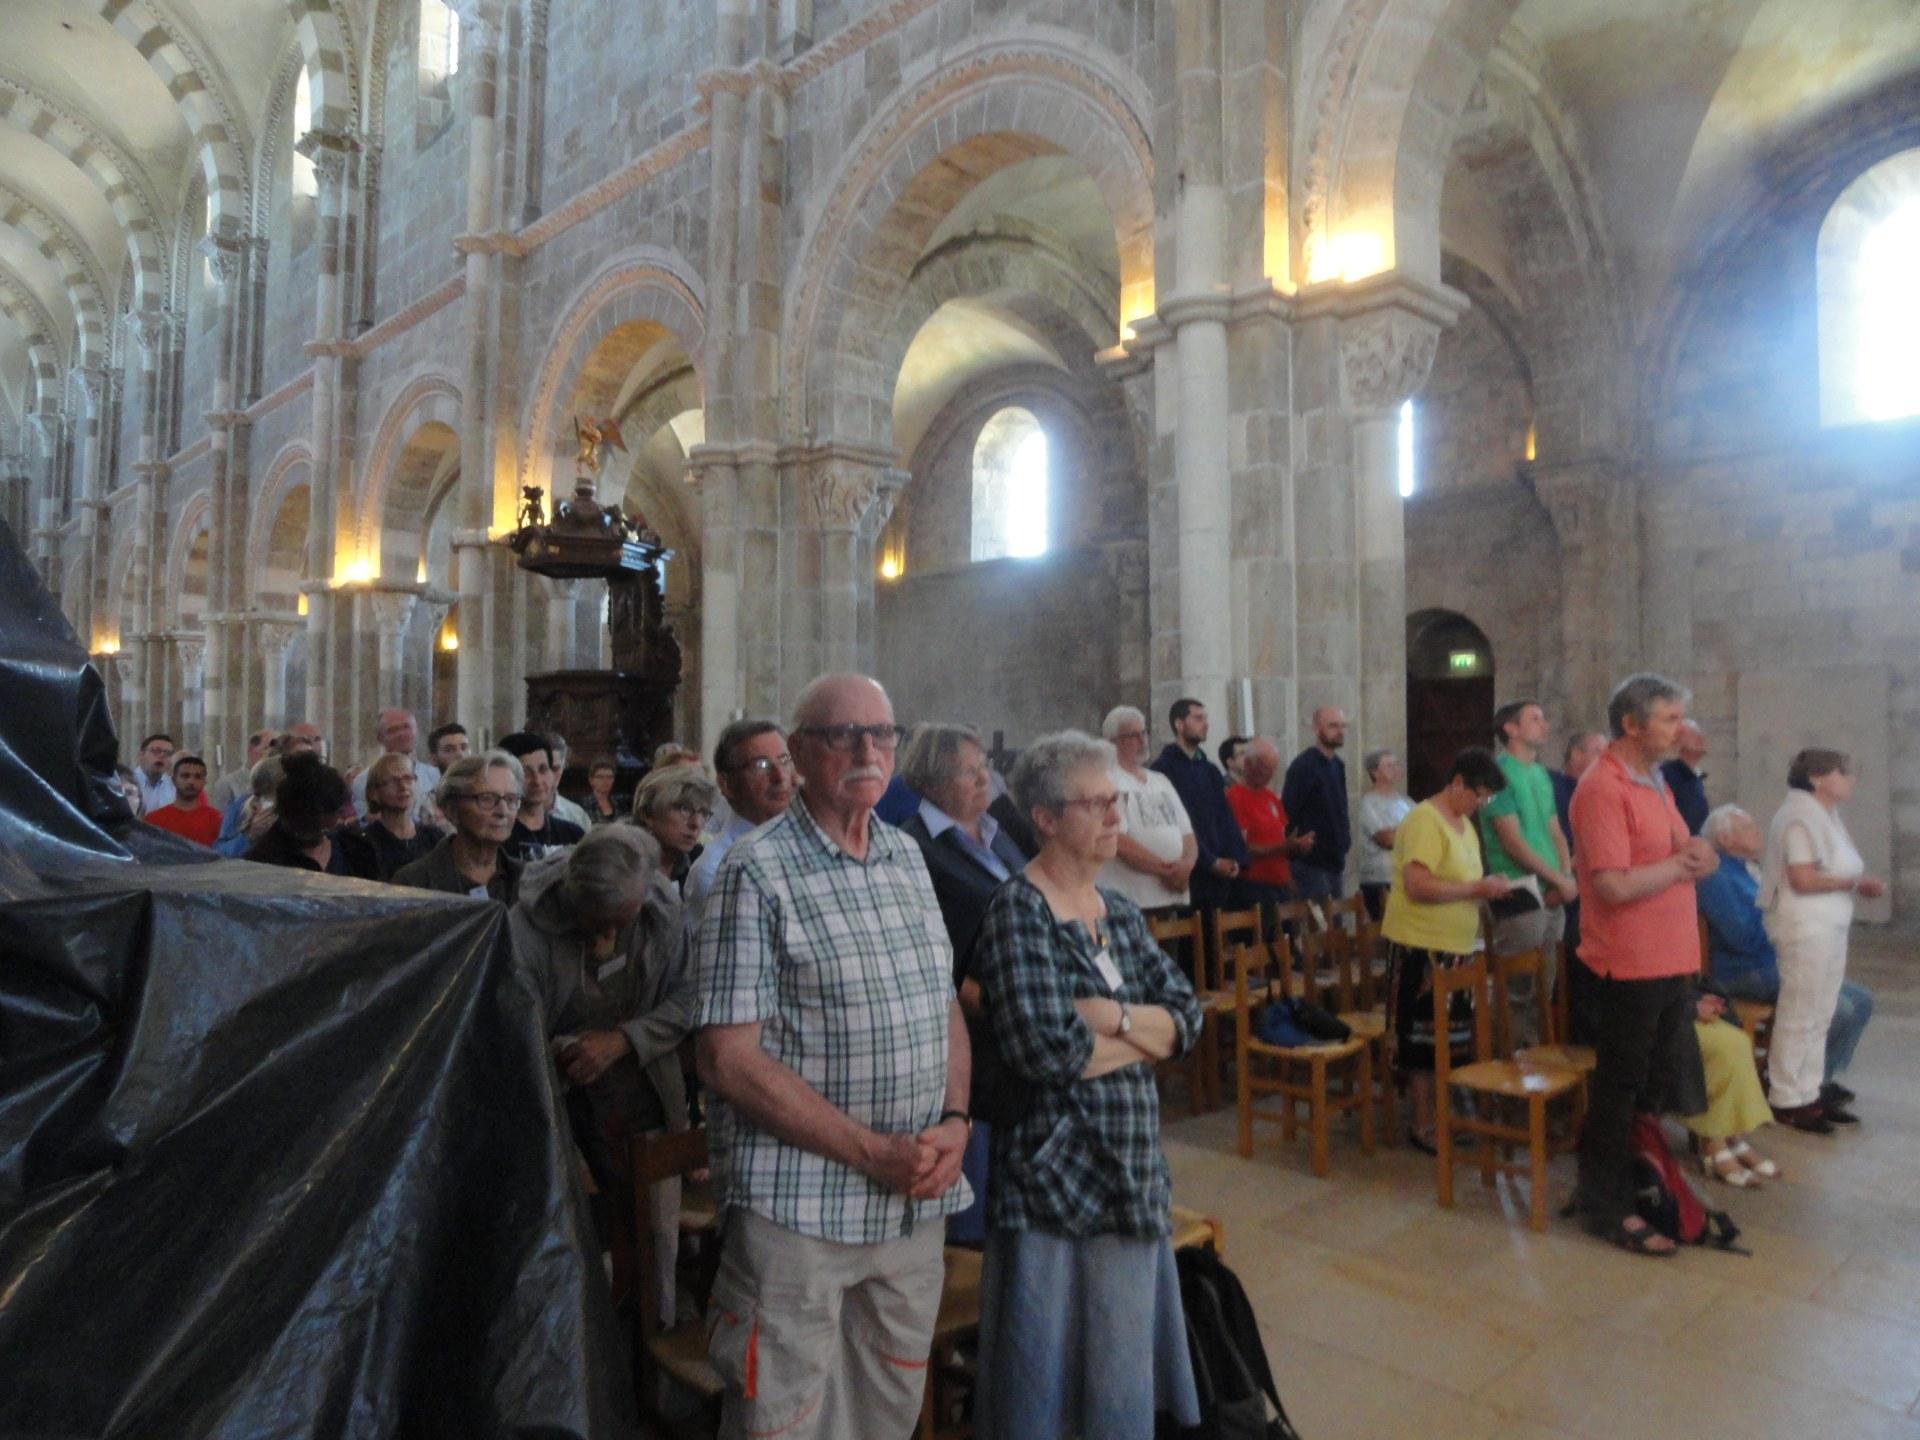 2017-06-16 - Pe#lerinage en Bourgogne - 047